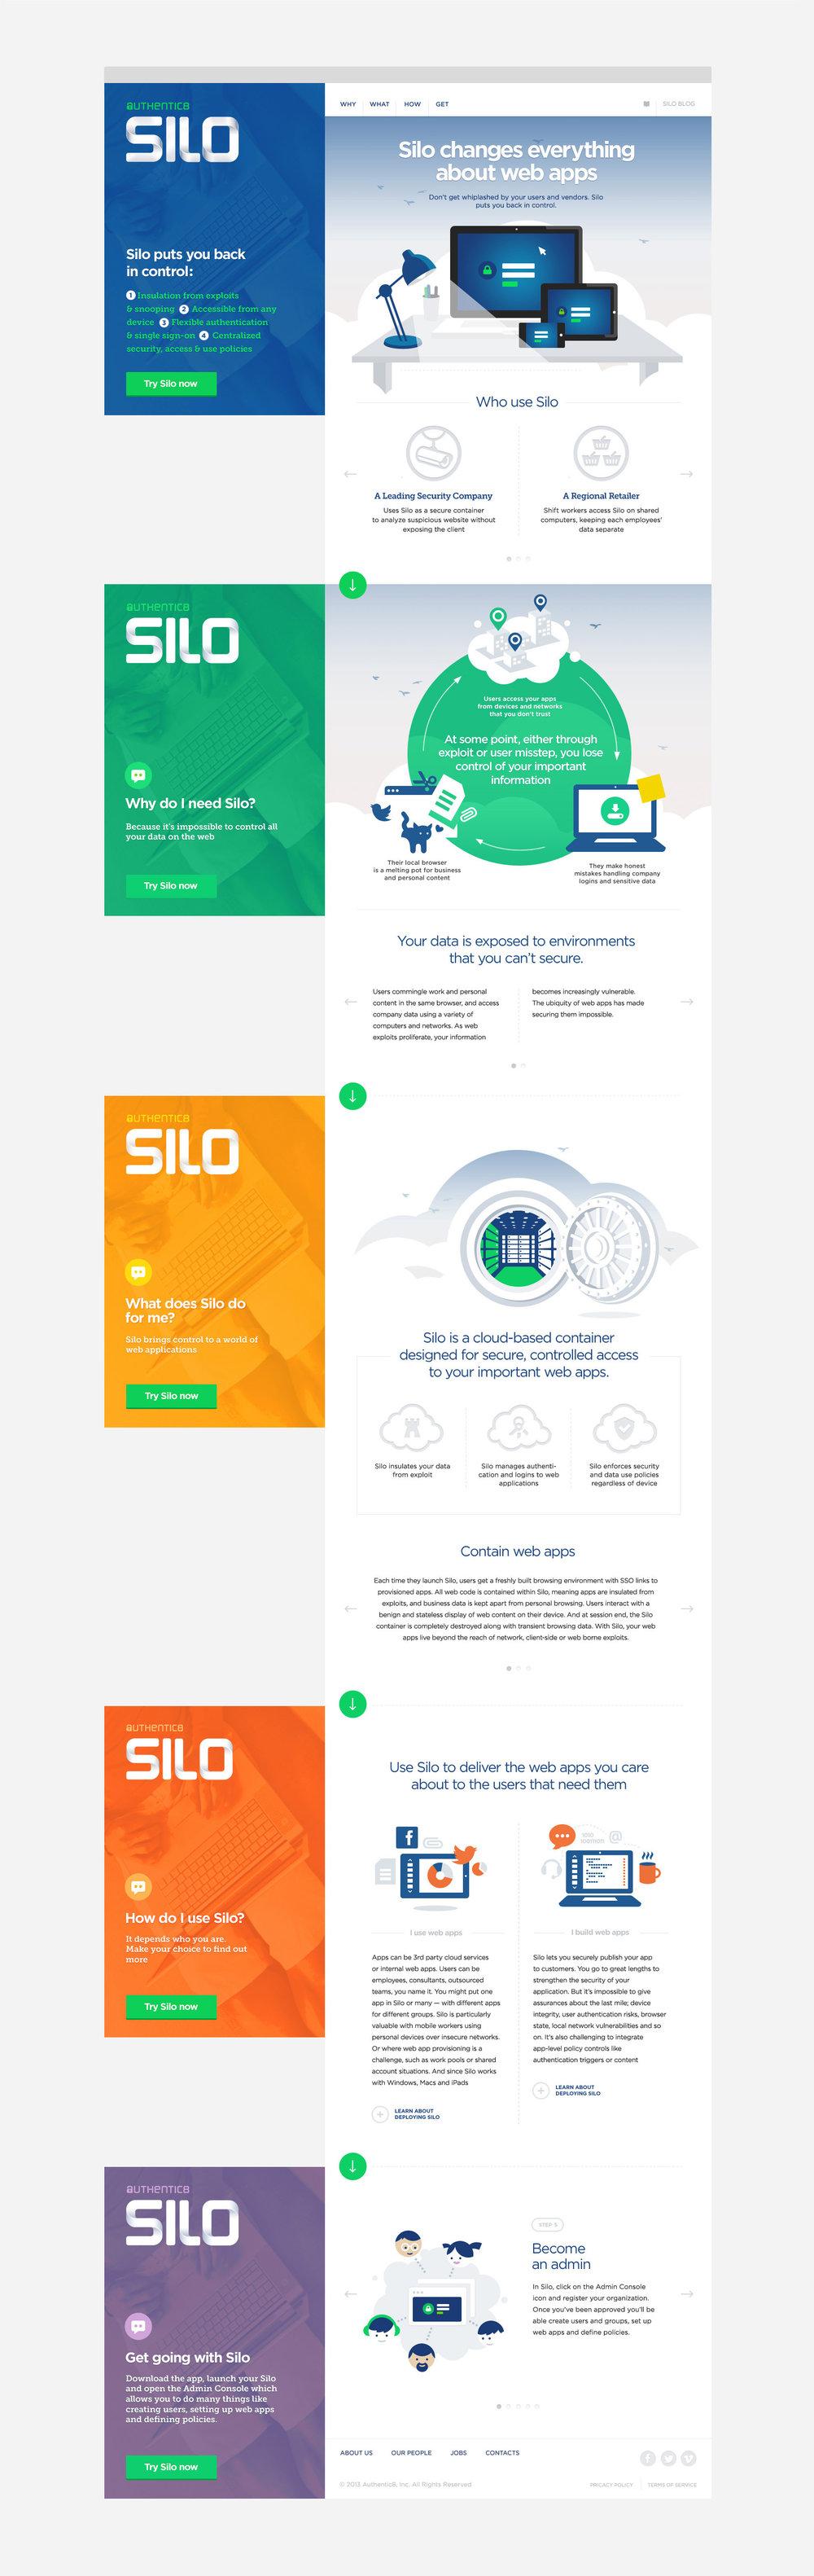 silo_browser.jpg